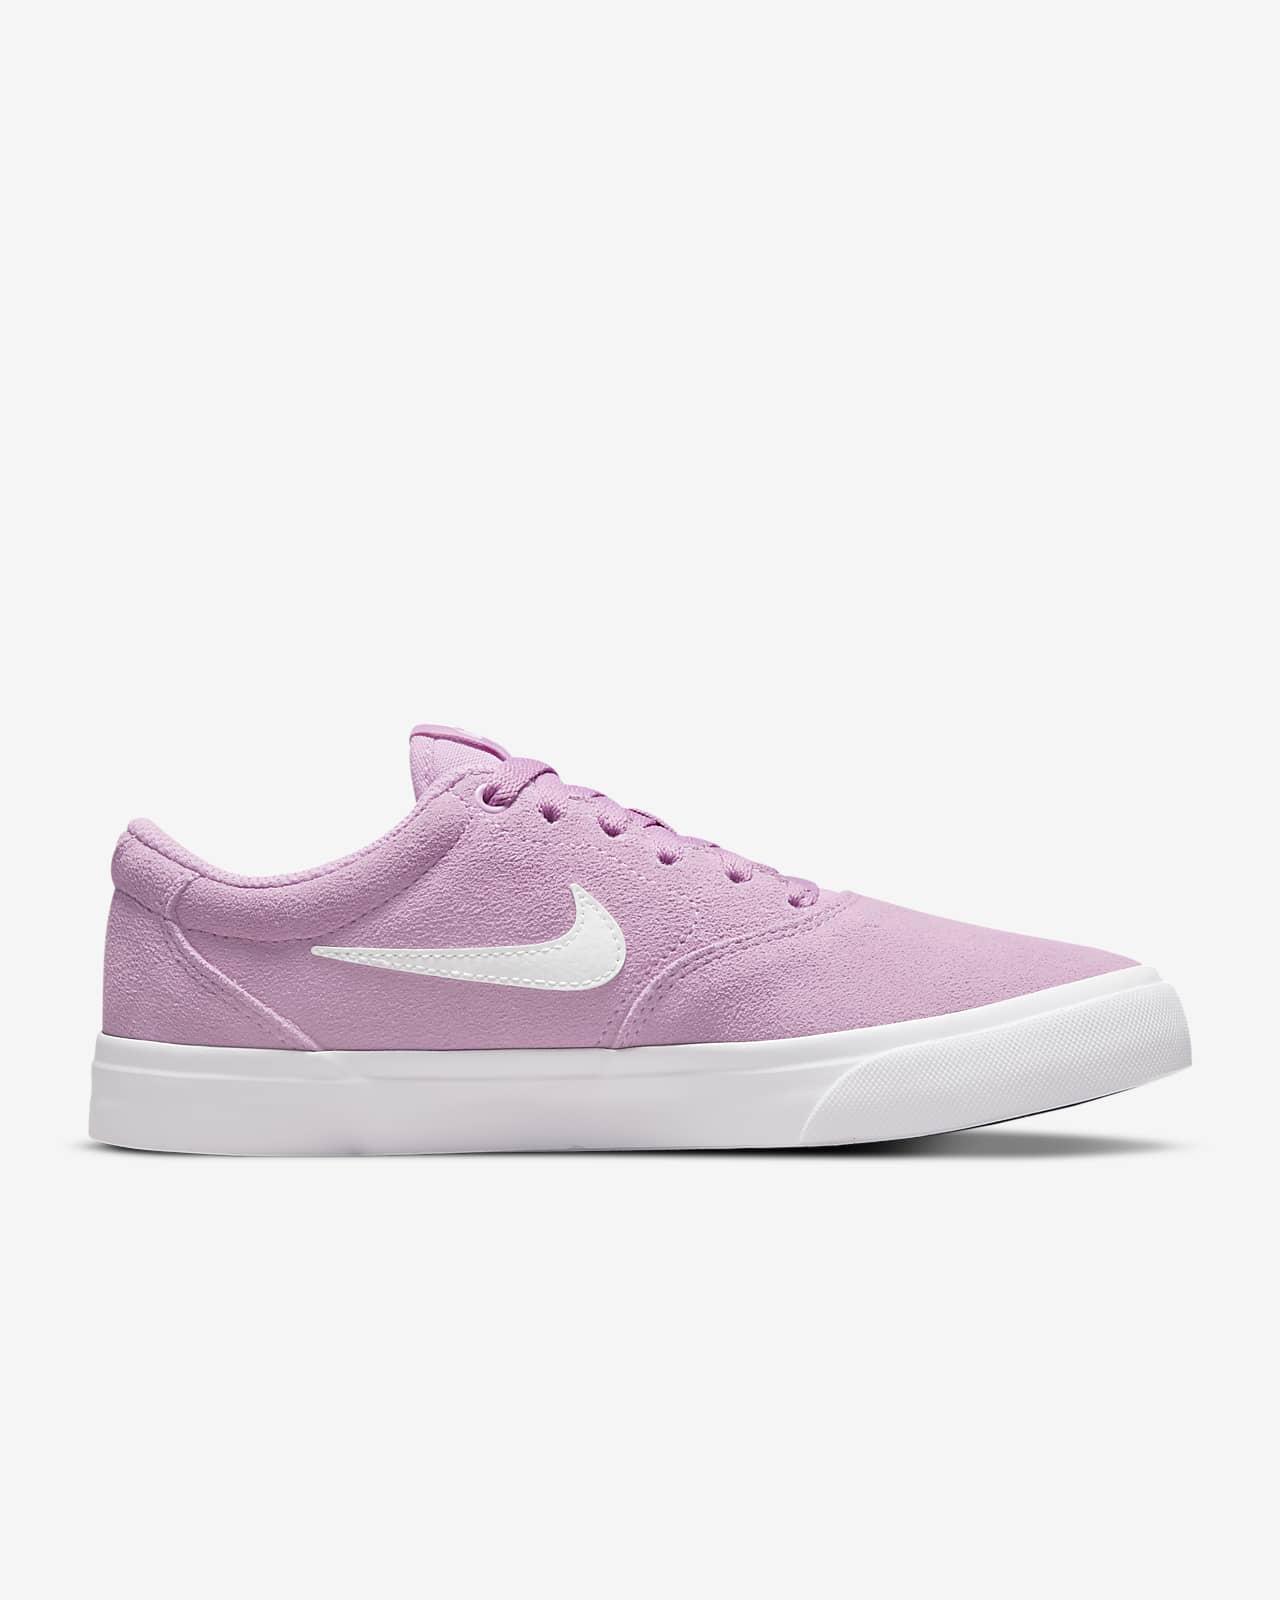 Nike SB Charge Suede Women's Skate Shoe. Nike LU